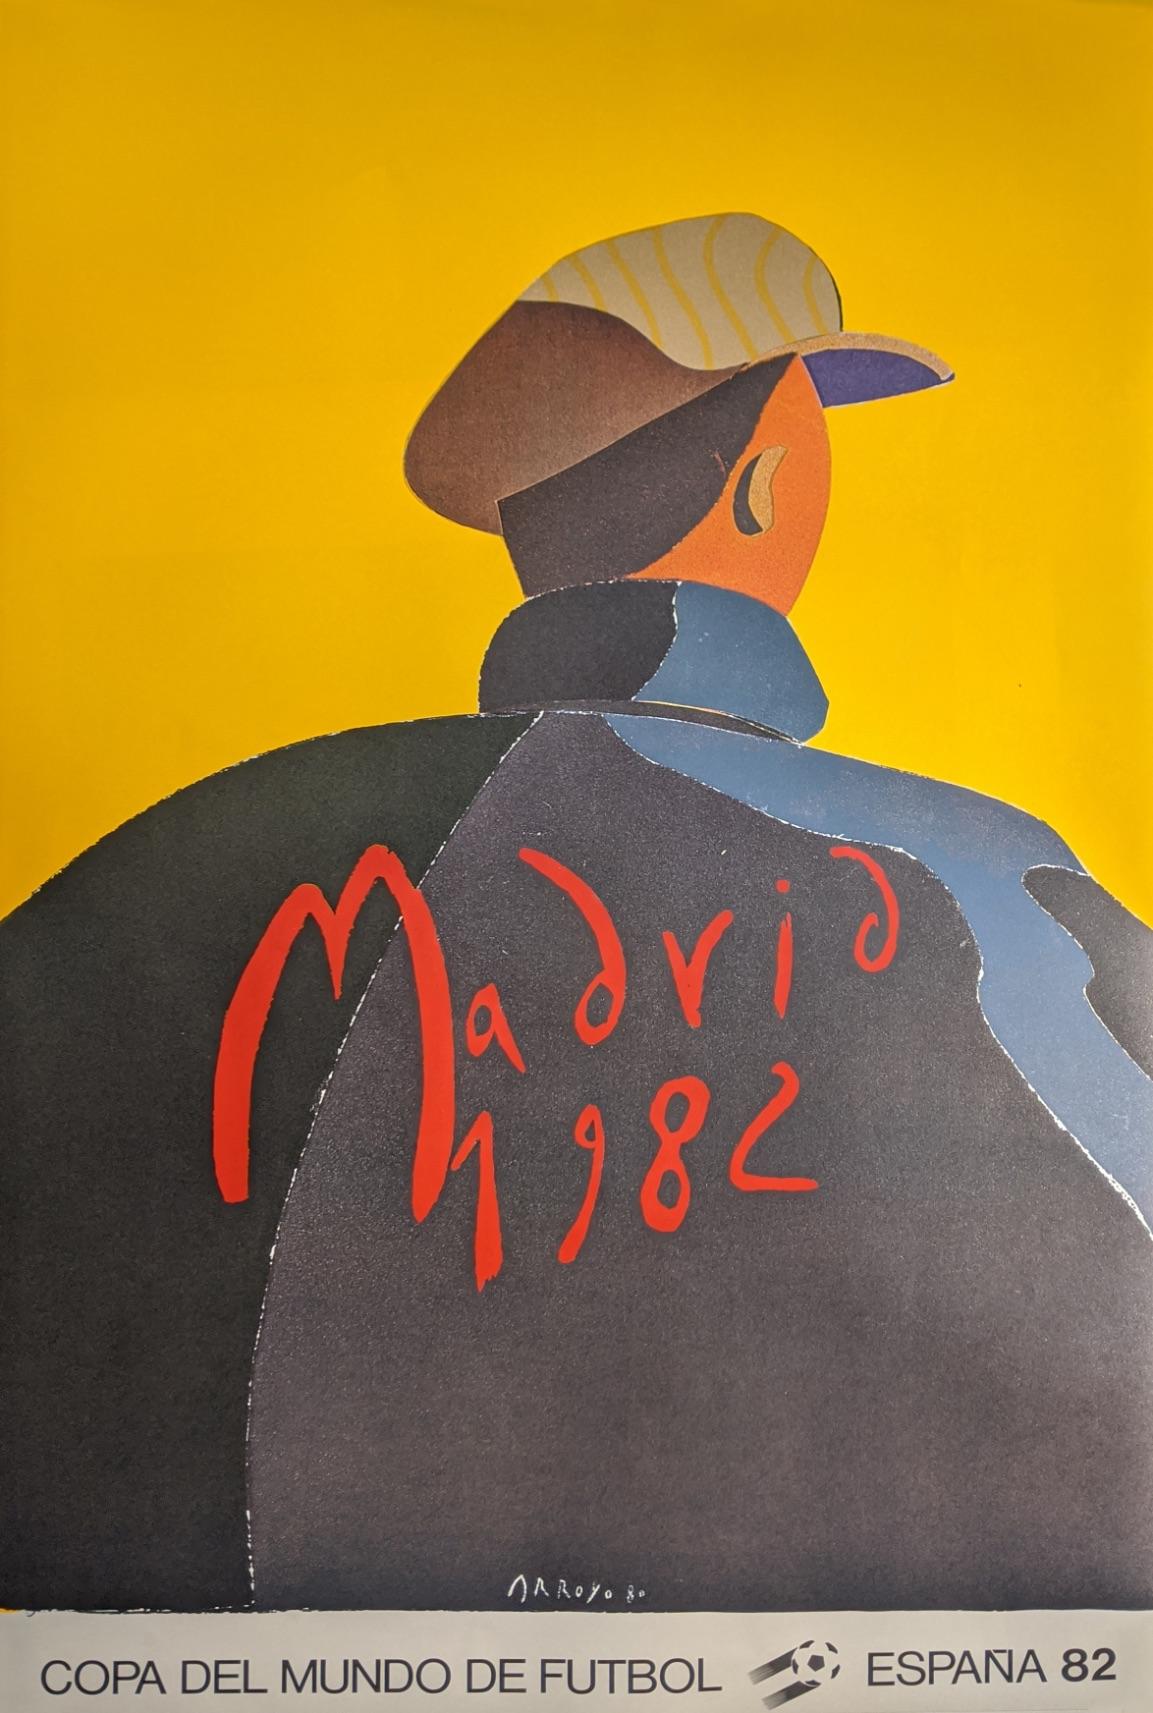 After Arroyo, Madrid 1982 Cope Del Mundo Espana 82 poster, H.94cm W.60cm